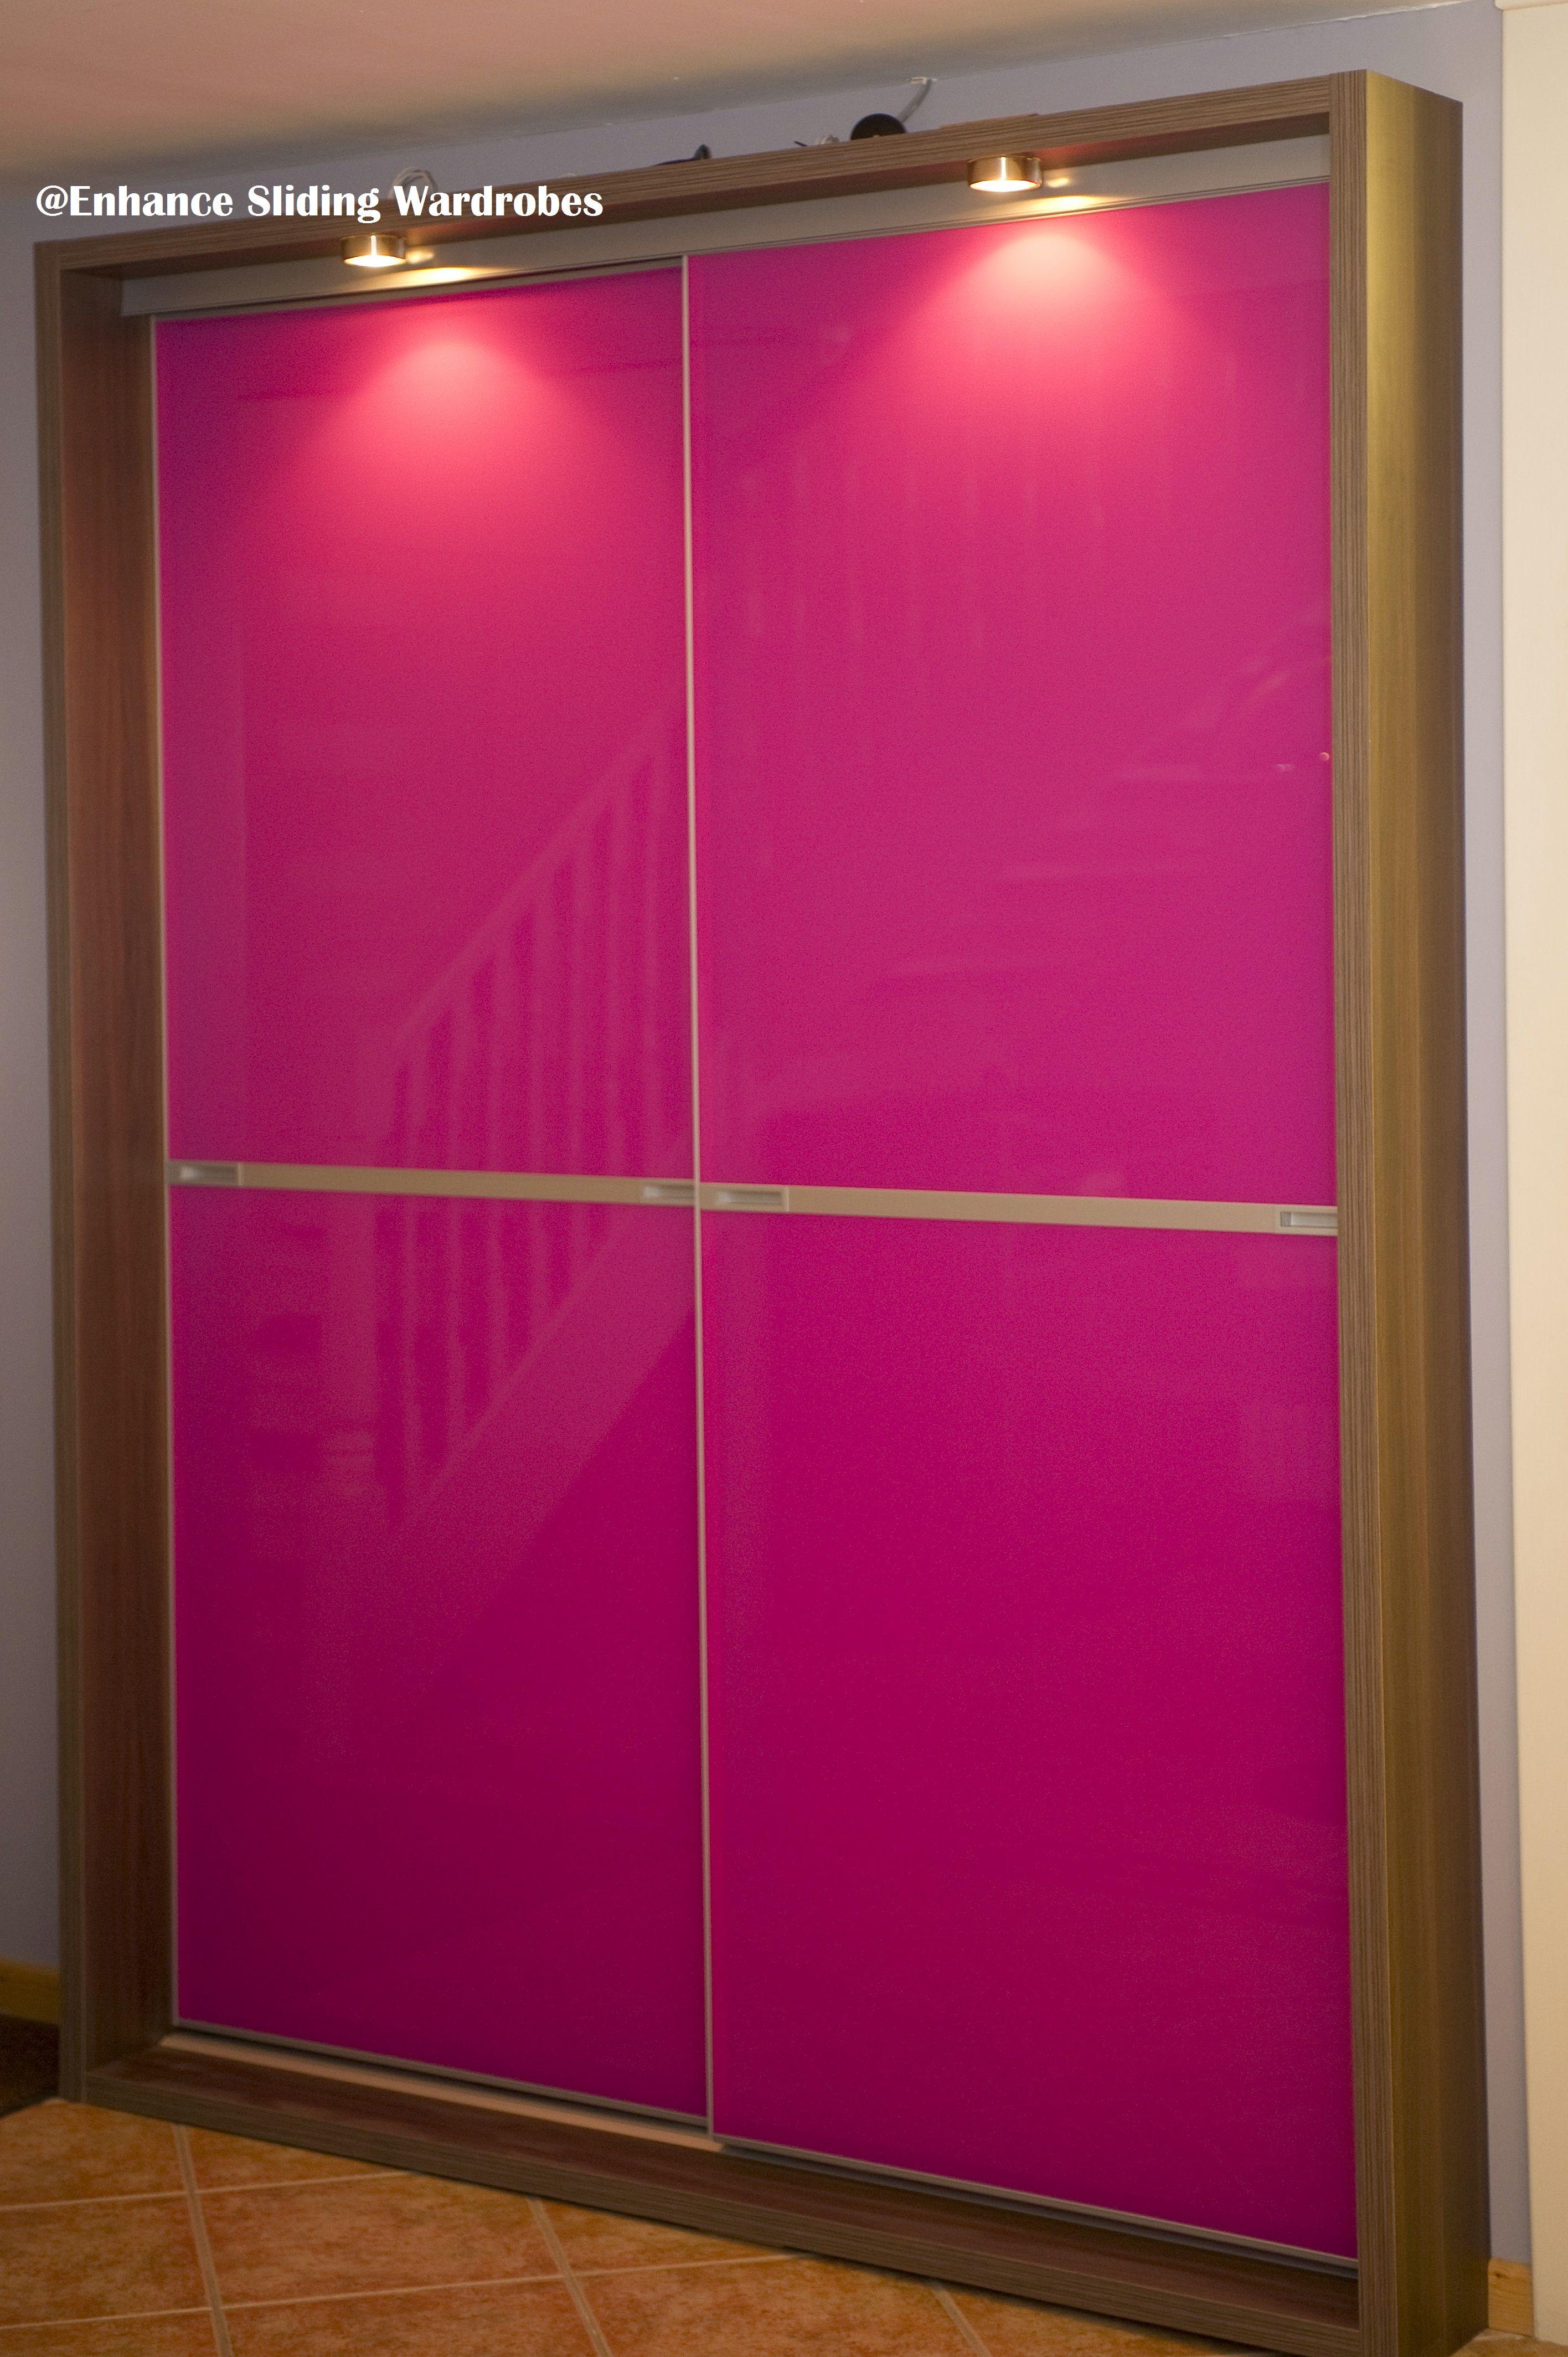 Pink Glass Sliding Wardrobe With Chrome Strap Bedroom Pink Wardrobe Designed By Enhance Sliding Wardrobe Sliding Wardrobe Designs Wardrobe Design Bedroom